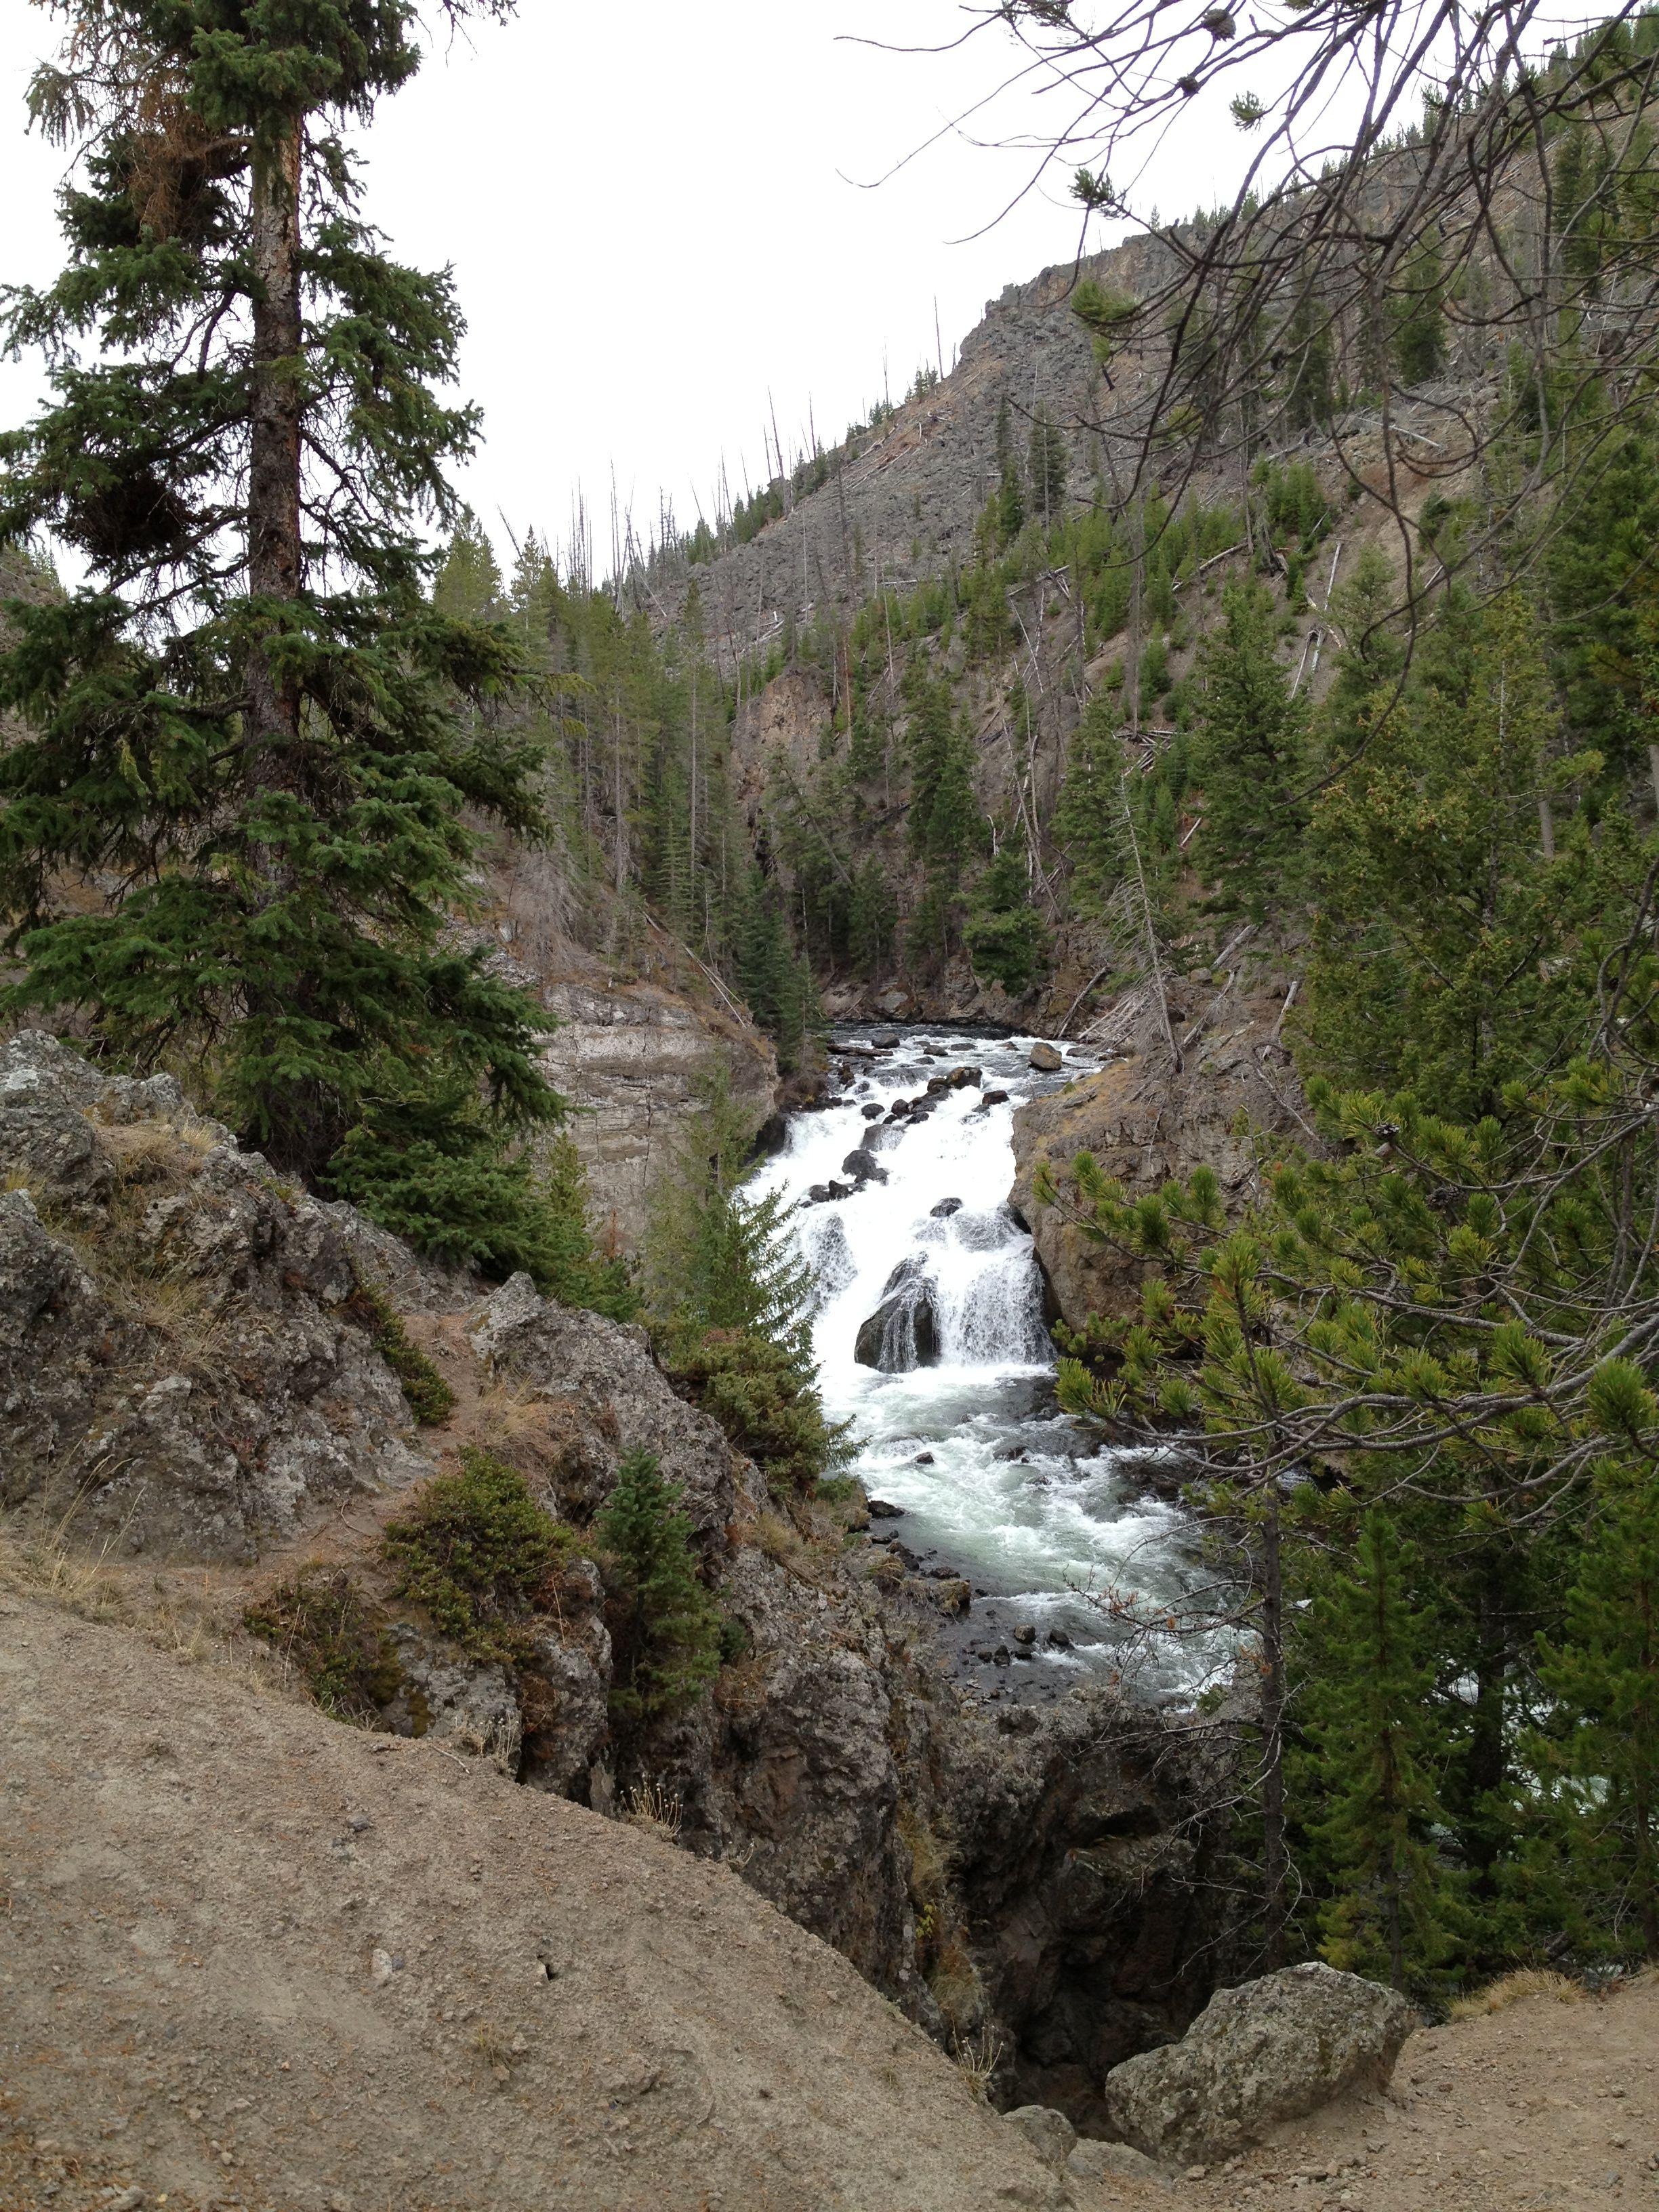 West Yellowstone, Montana, U.S.A.